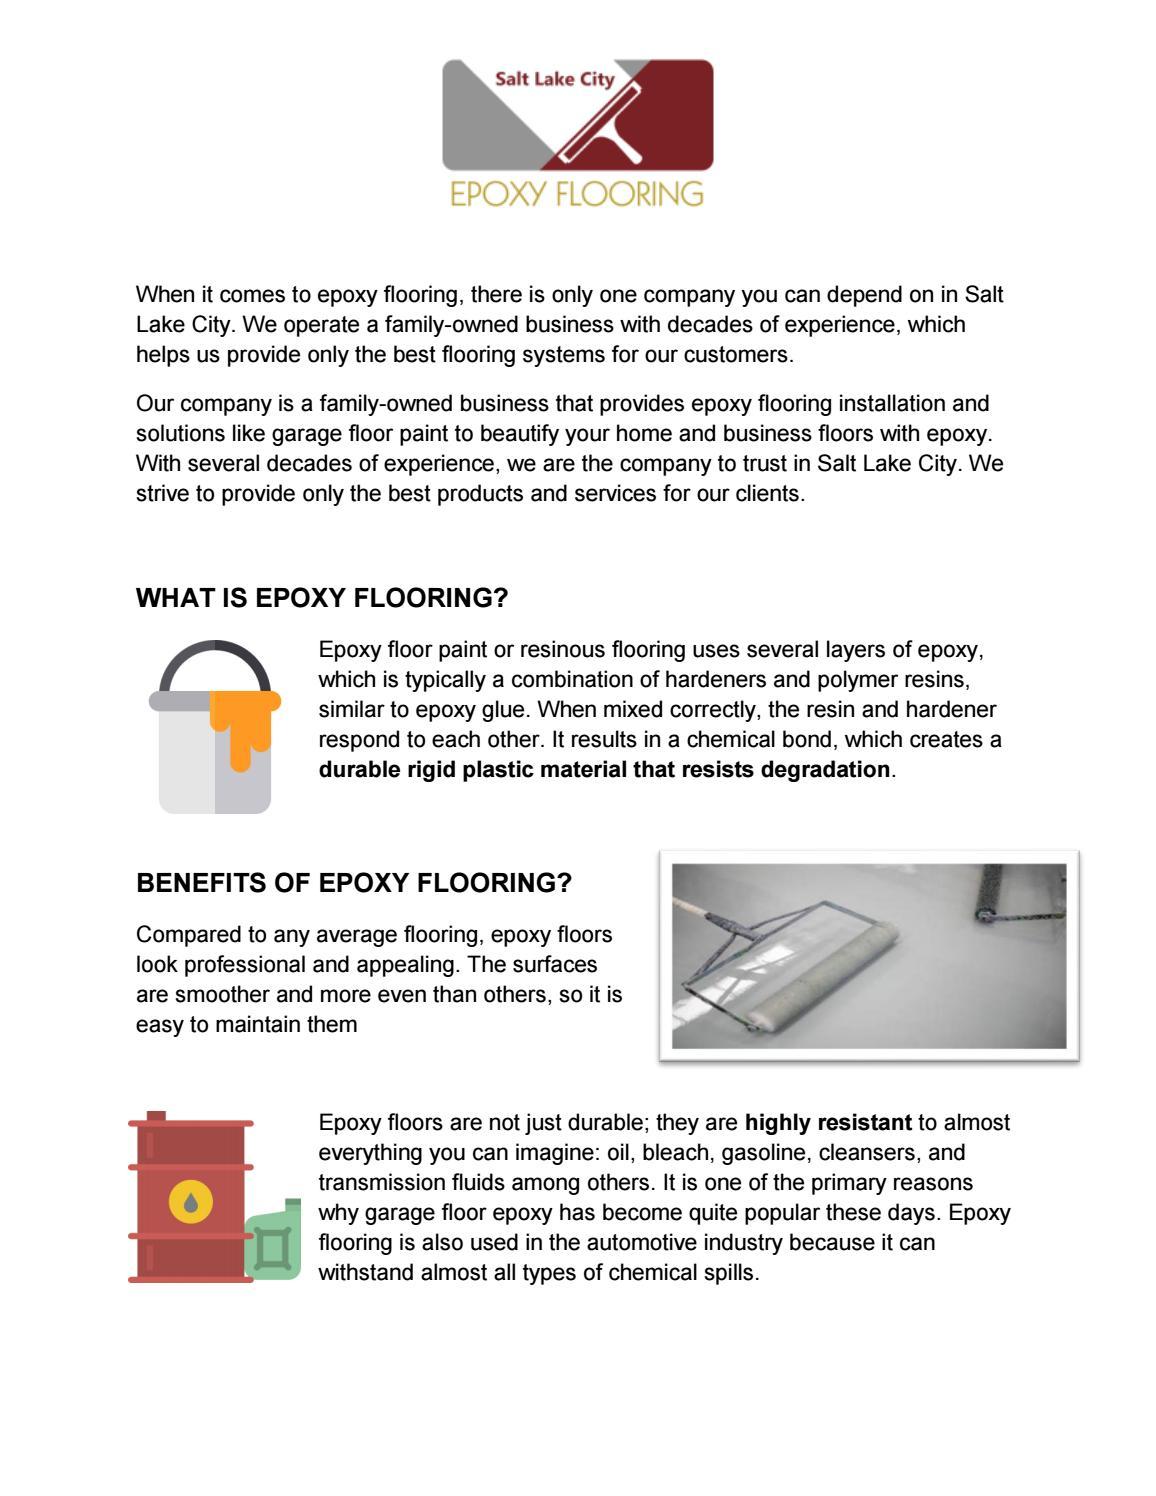 Epoxy Flooring Salt Lake City: Best Epoxy Flooring Installation